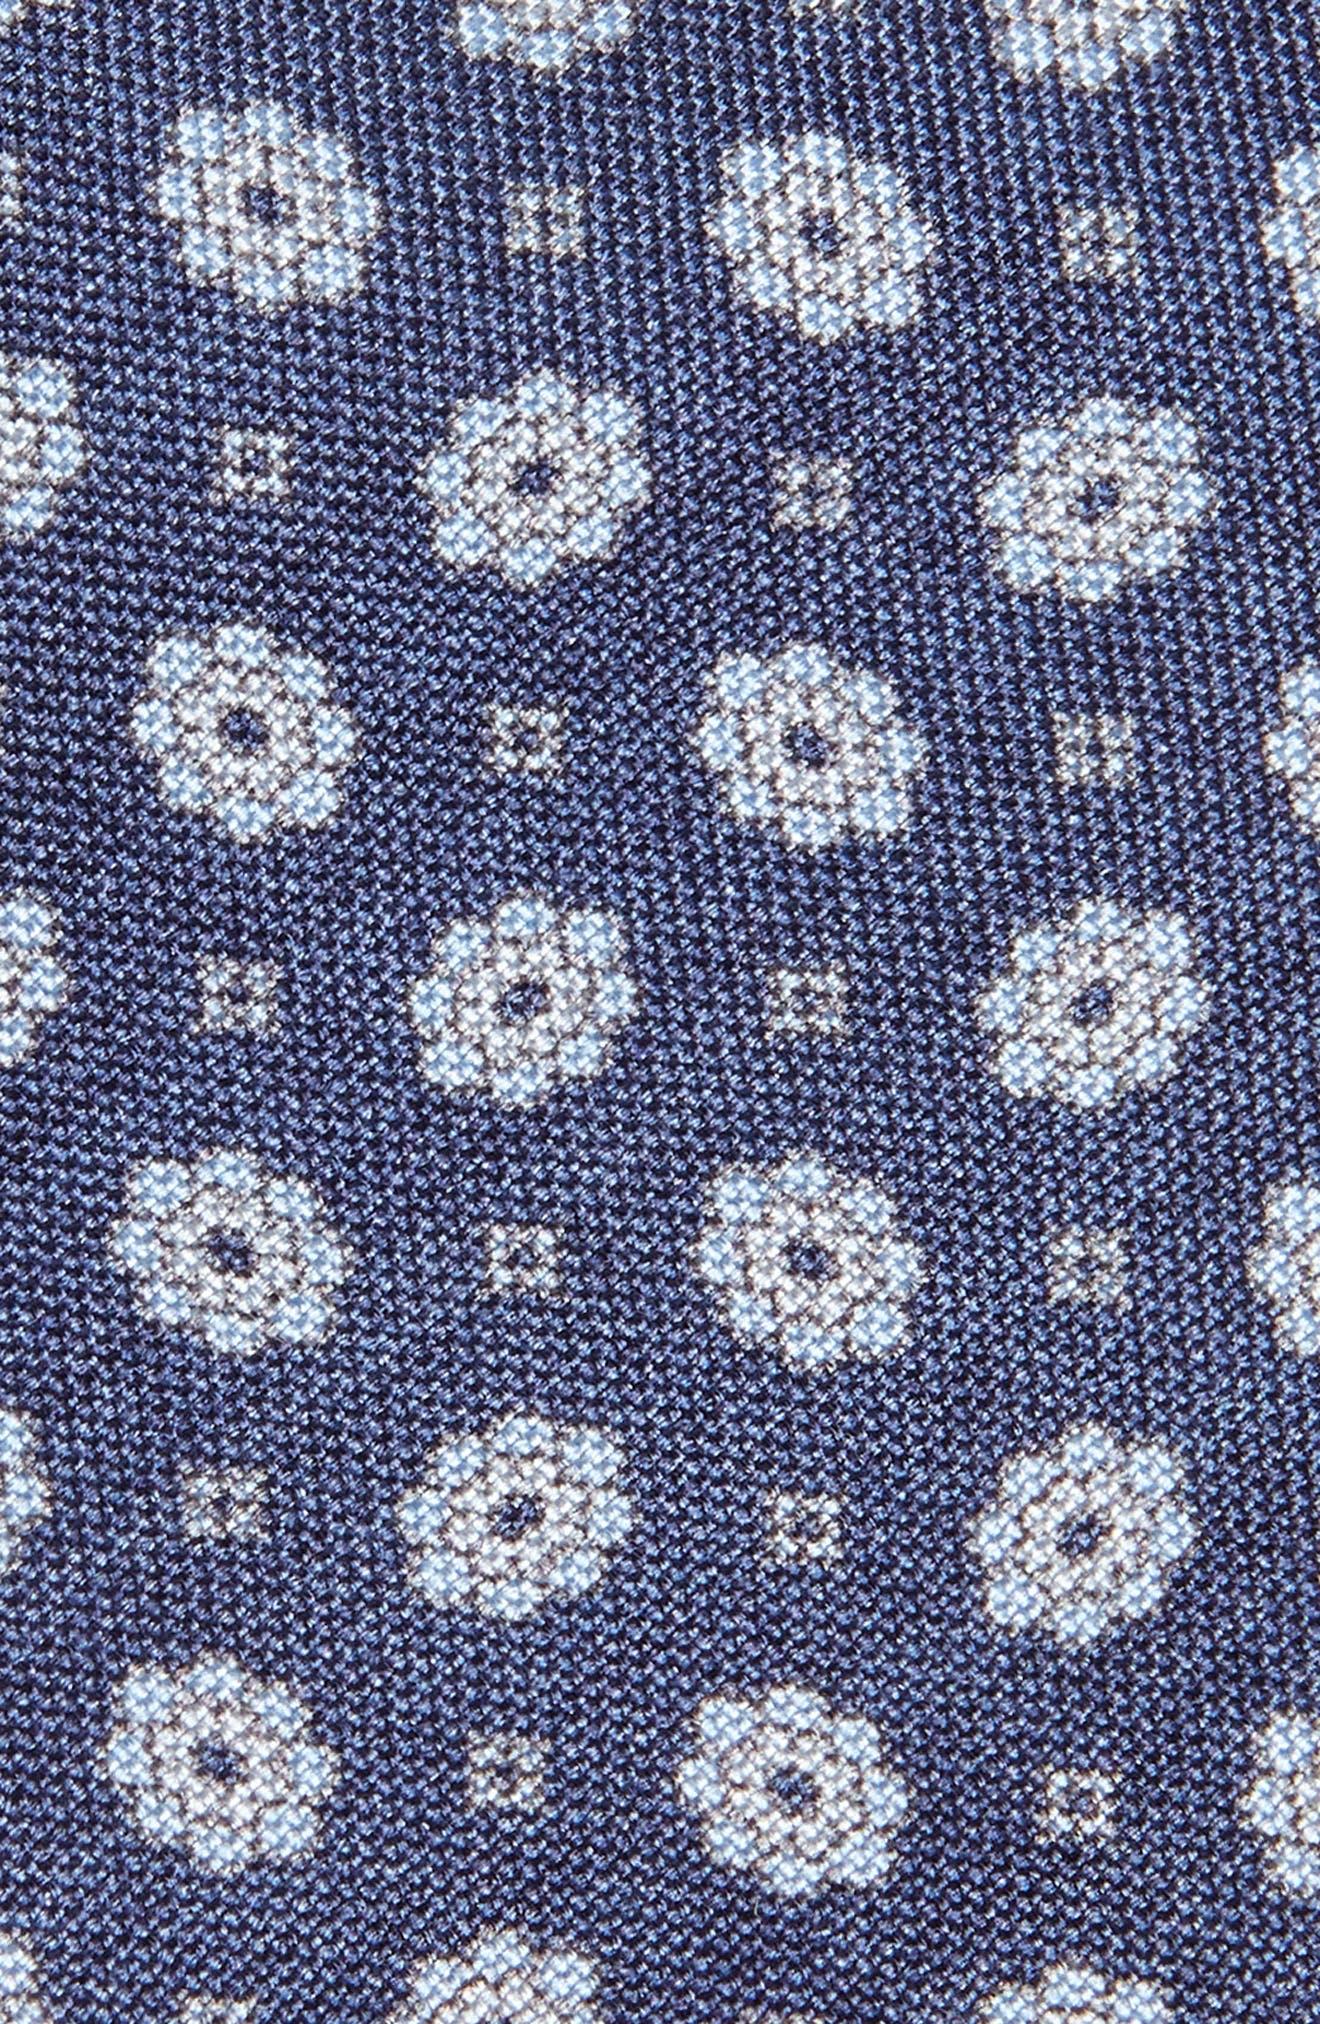 Floral Medallion Skinny Silk Tie,                             Alternate thumbnail 2, color,                             DENIM BLUE